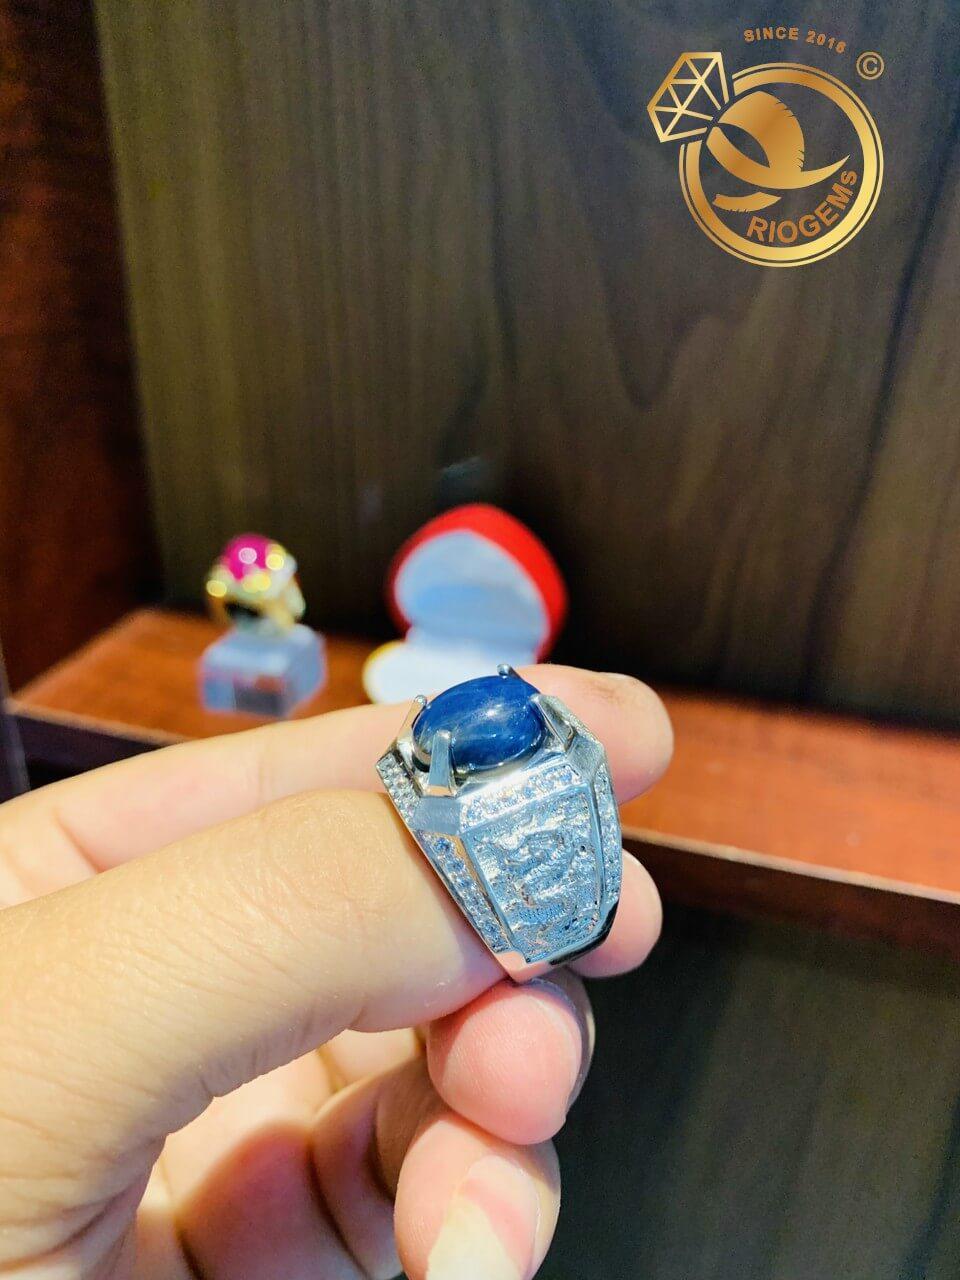 nhan nam vang trang 18k dinh da sapphire xanh duong hero phong thuy